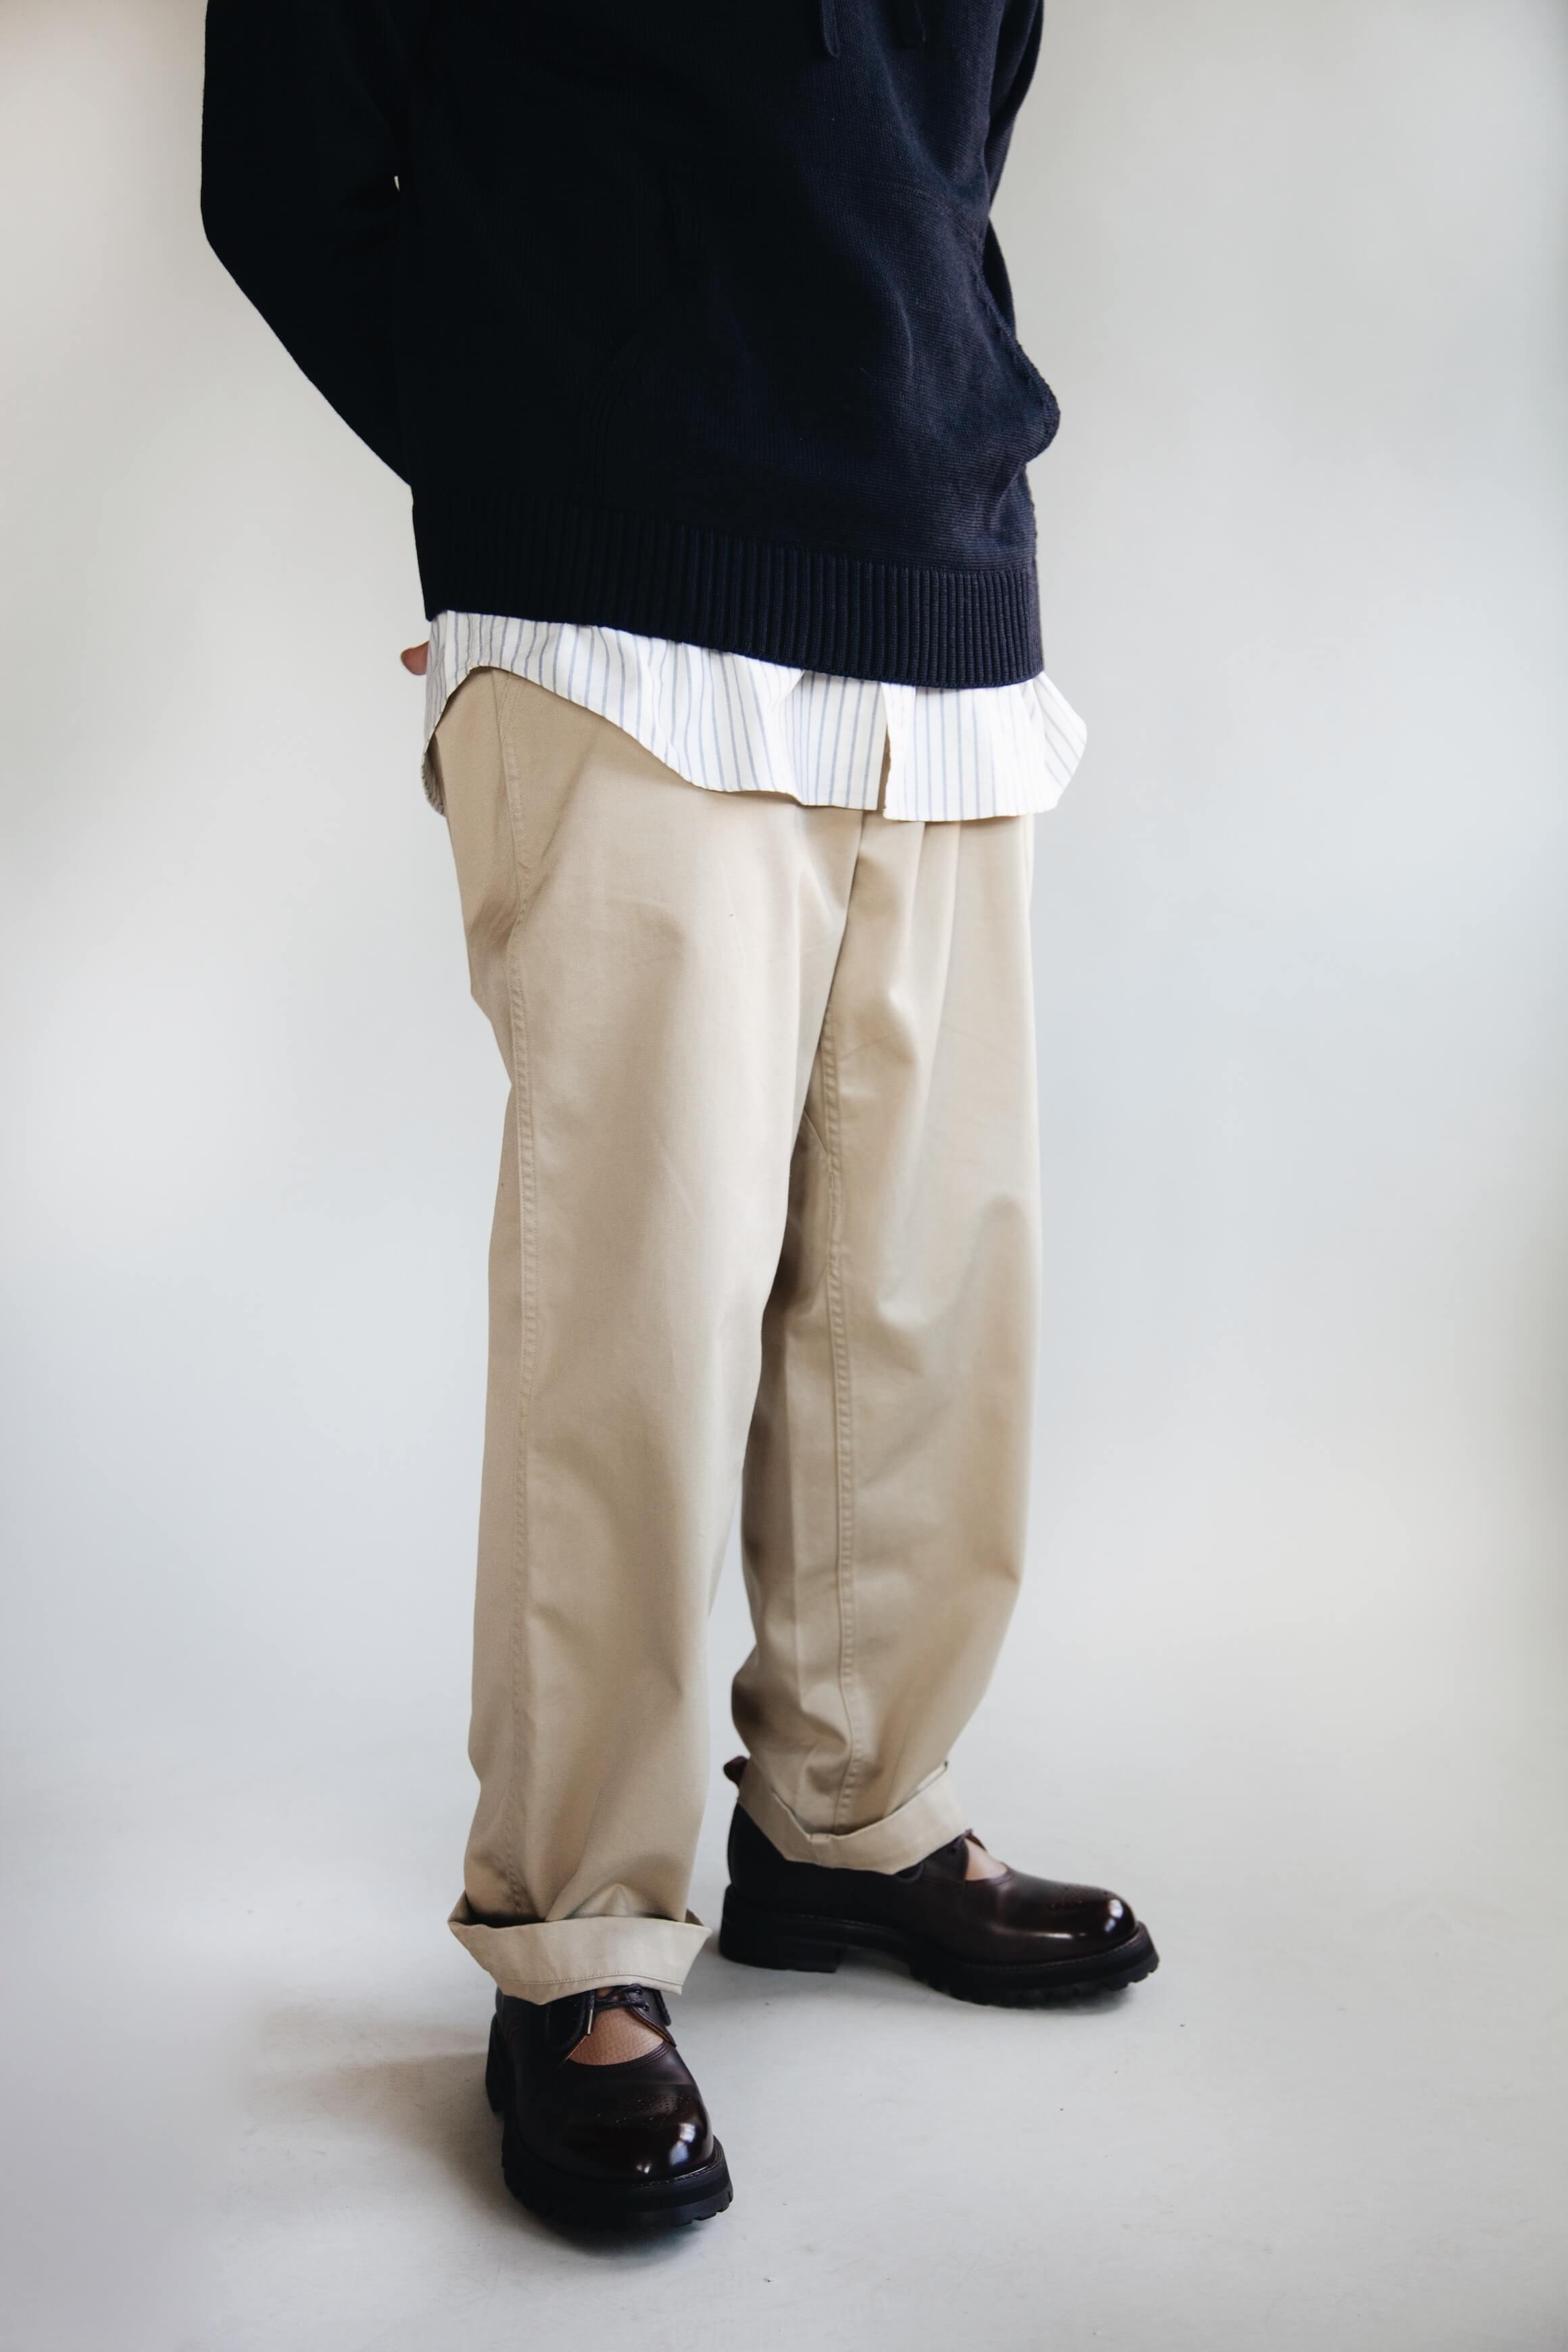 arpenteur primo sweater, arpenteur doris shirt, nanamica wide chino pants and hender scheme commando bluchers on body